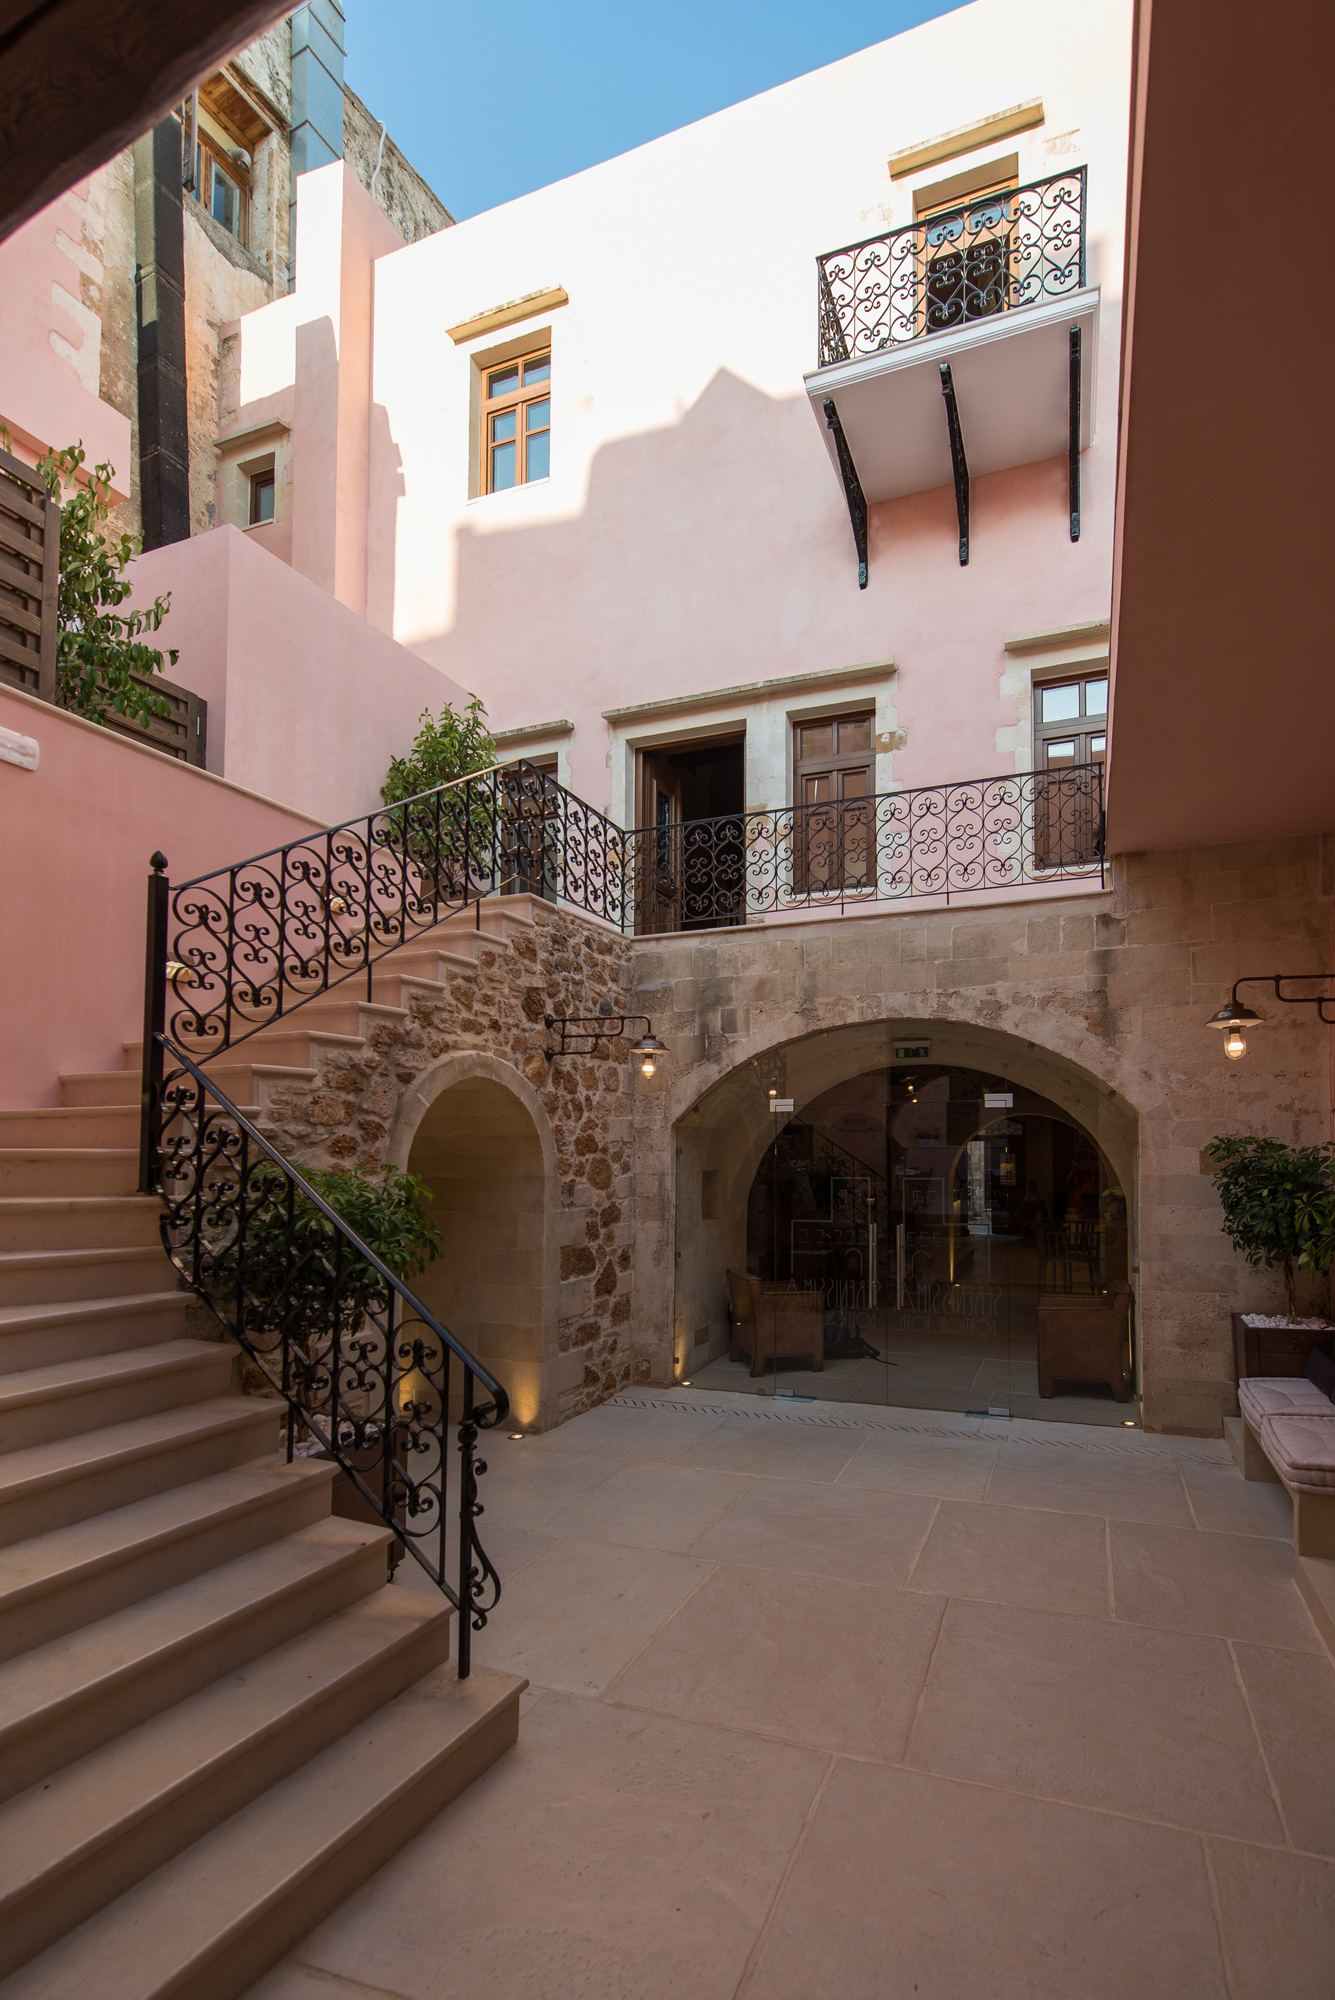 Sereniss-Stair courtyard3.jpg